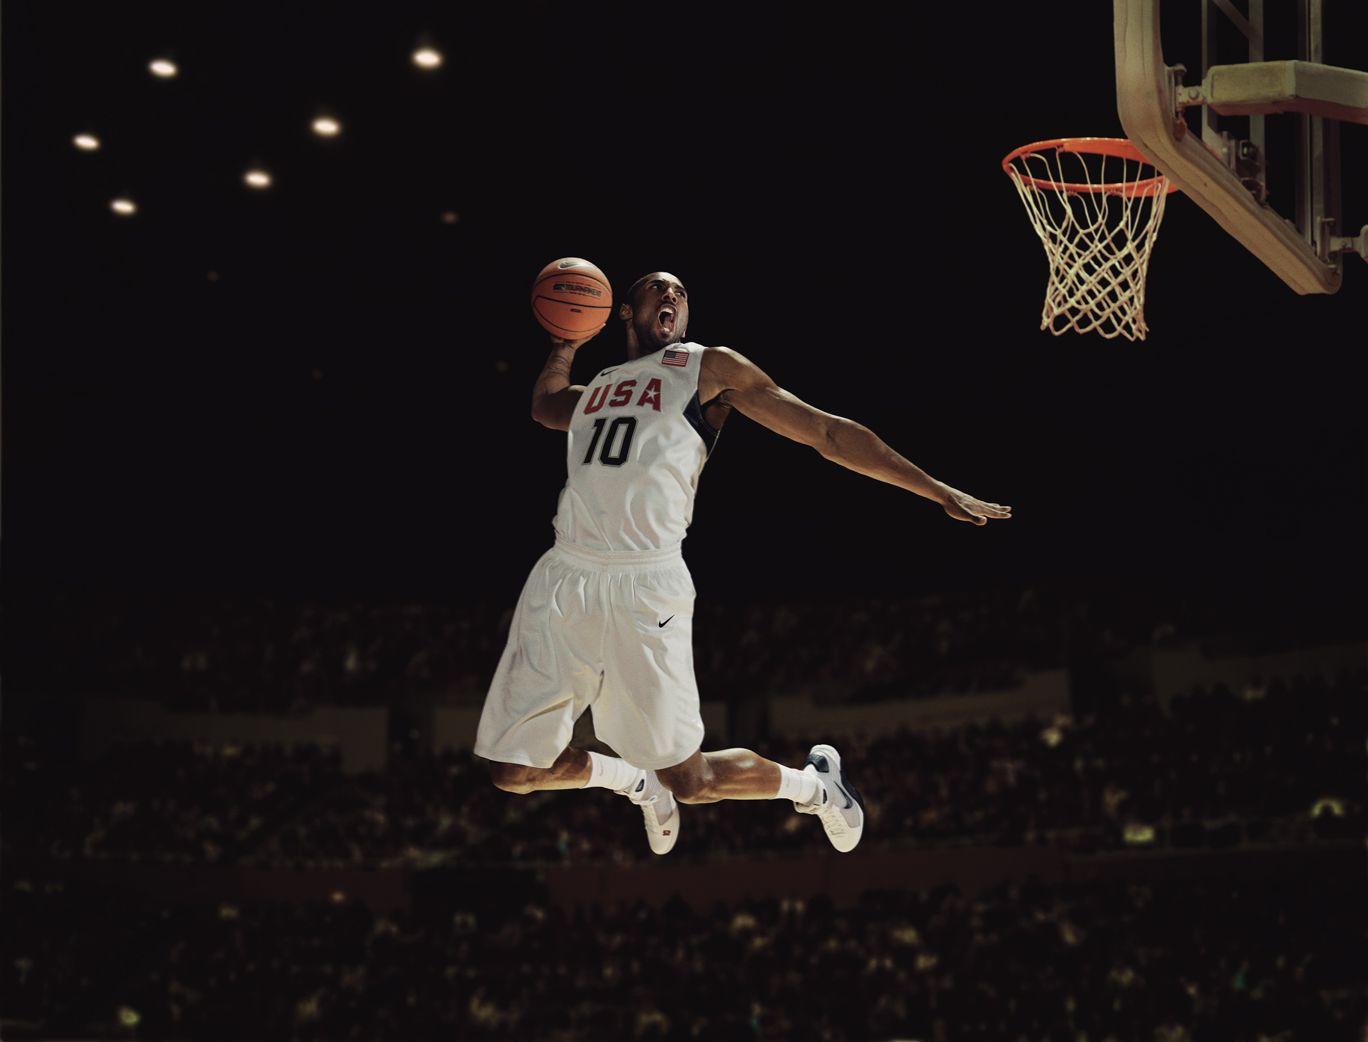 Pin By Monster Monkeyking On Sports Kobe Bryant Pictures Kobe Bryant Wallpapers Kobe Bryant Wallpaper Hd